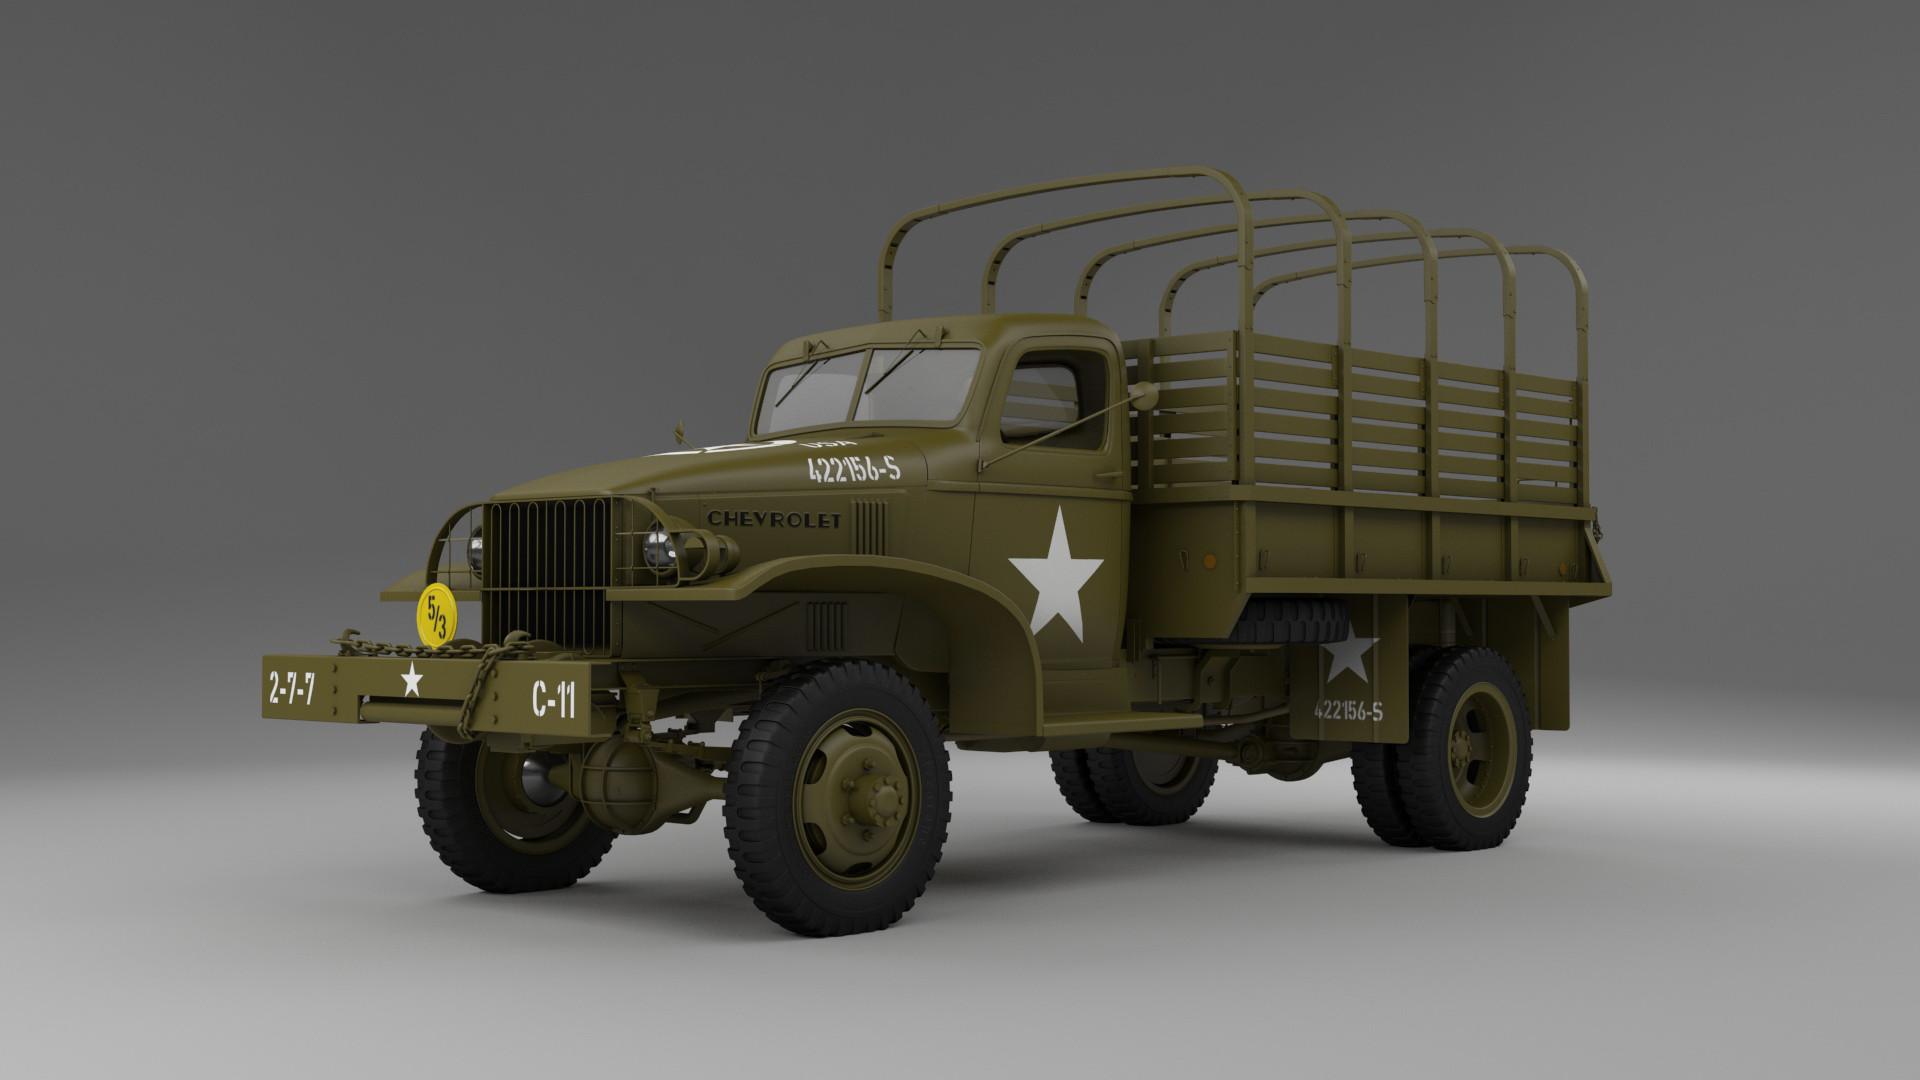 Jan Mostek - Chevrolet 1 1/2 ton WWII truck